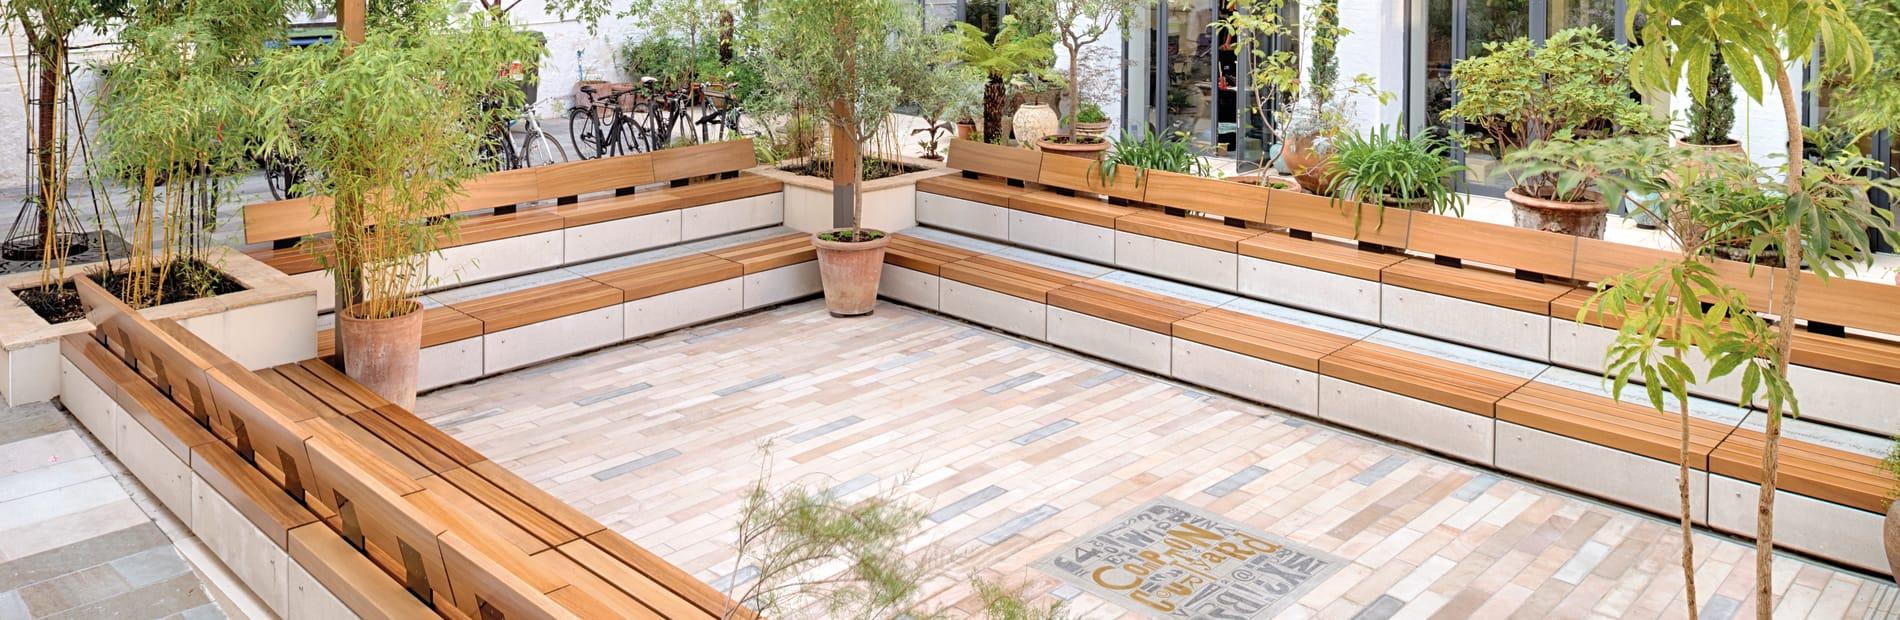 Metrolinia seating in Design Space Courtyard